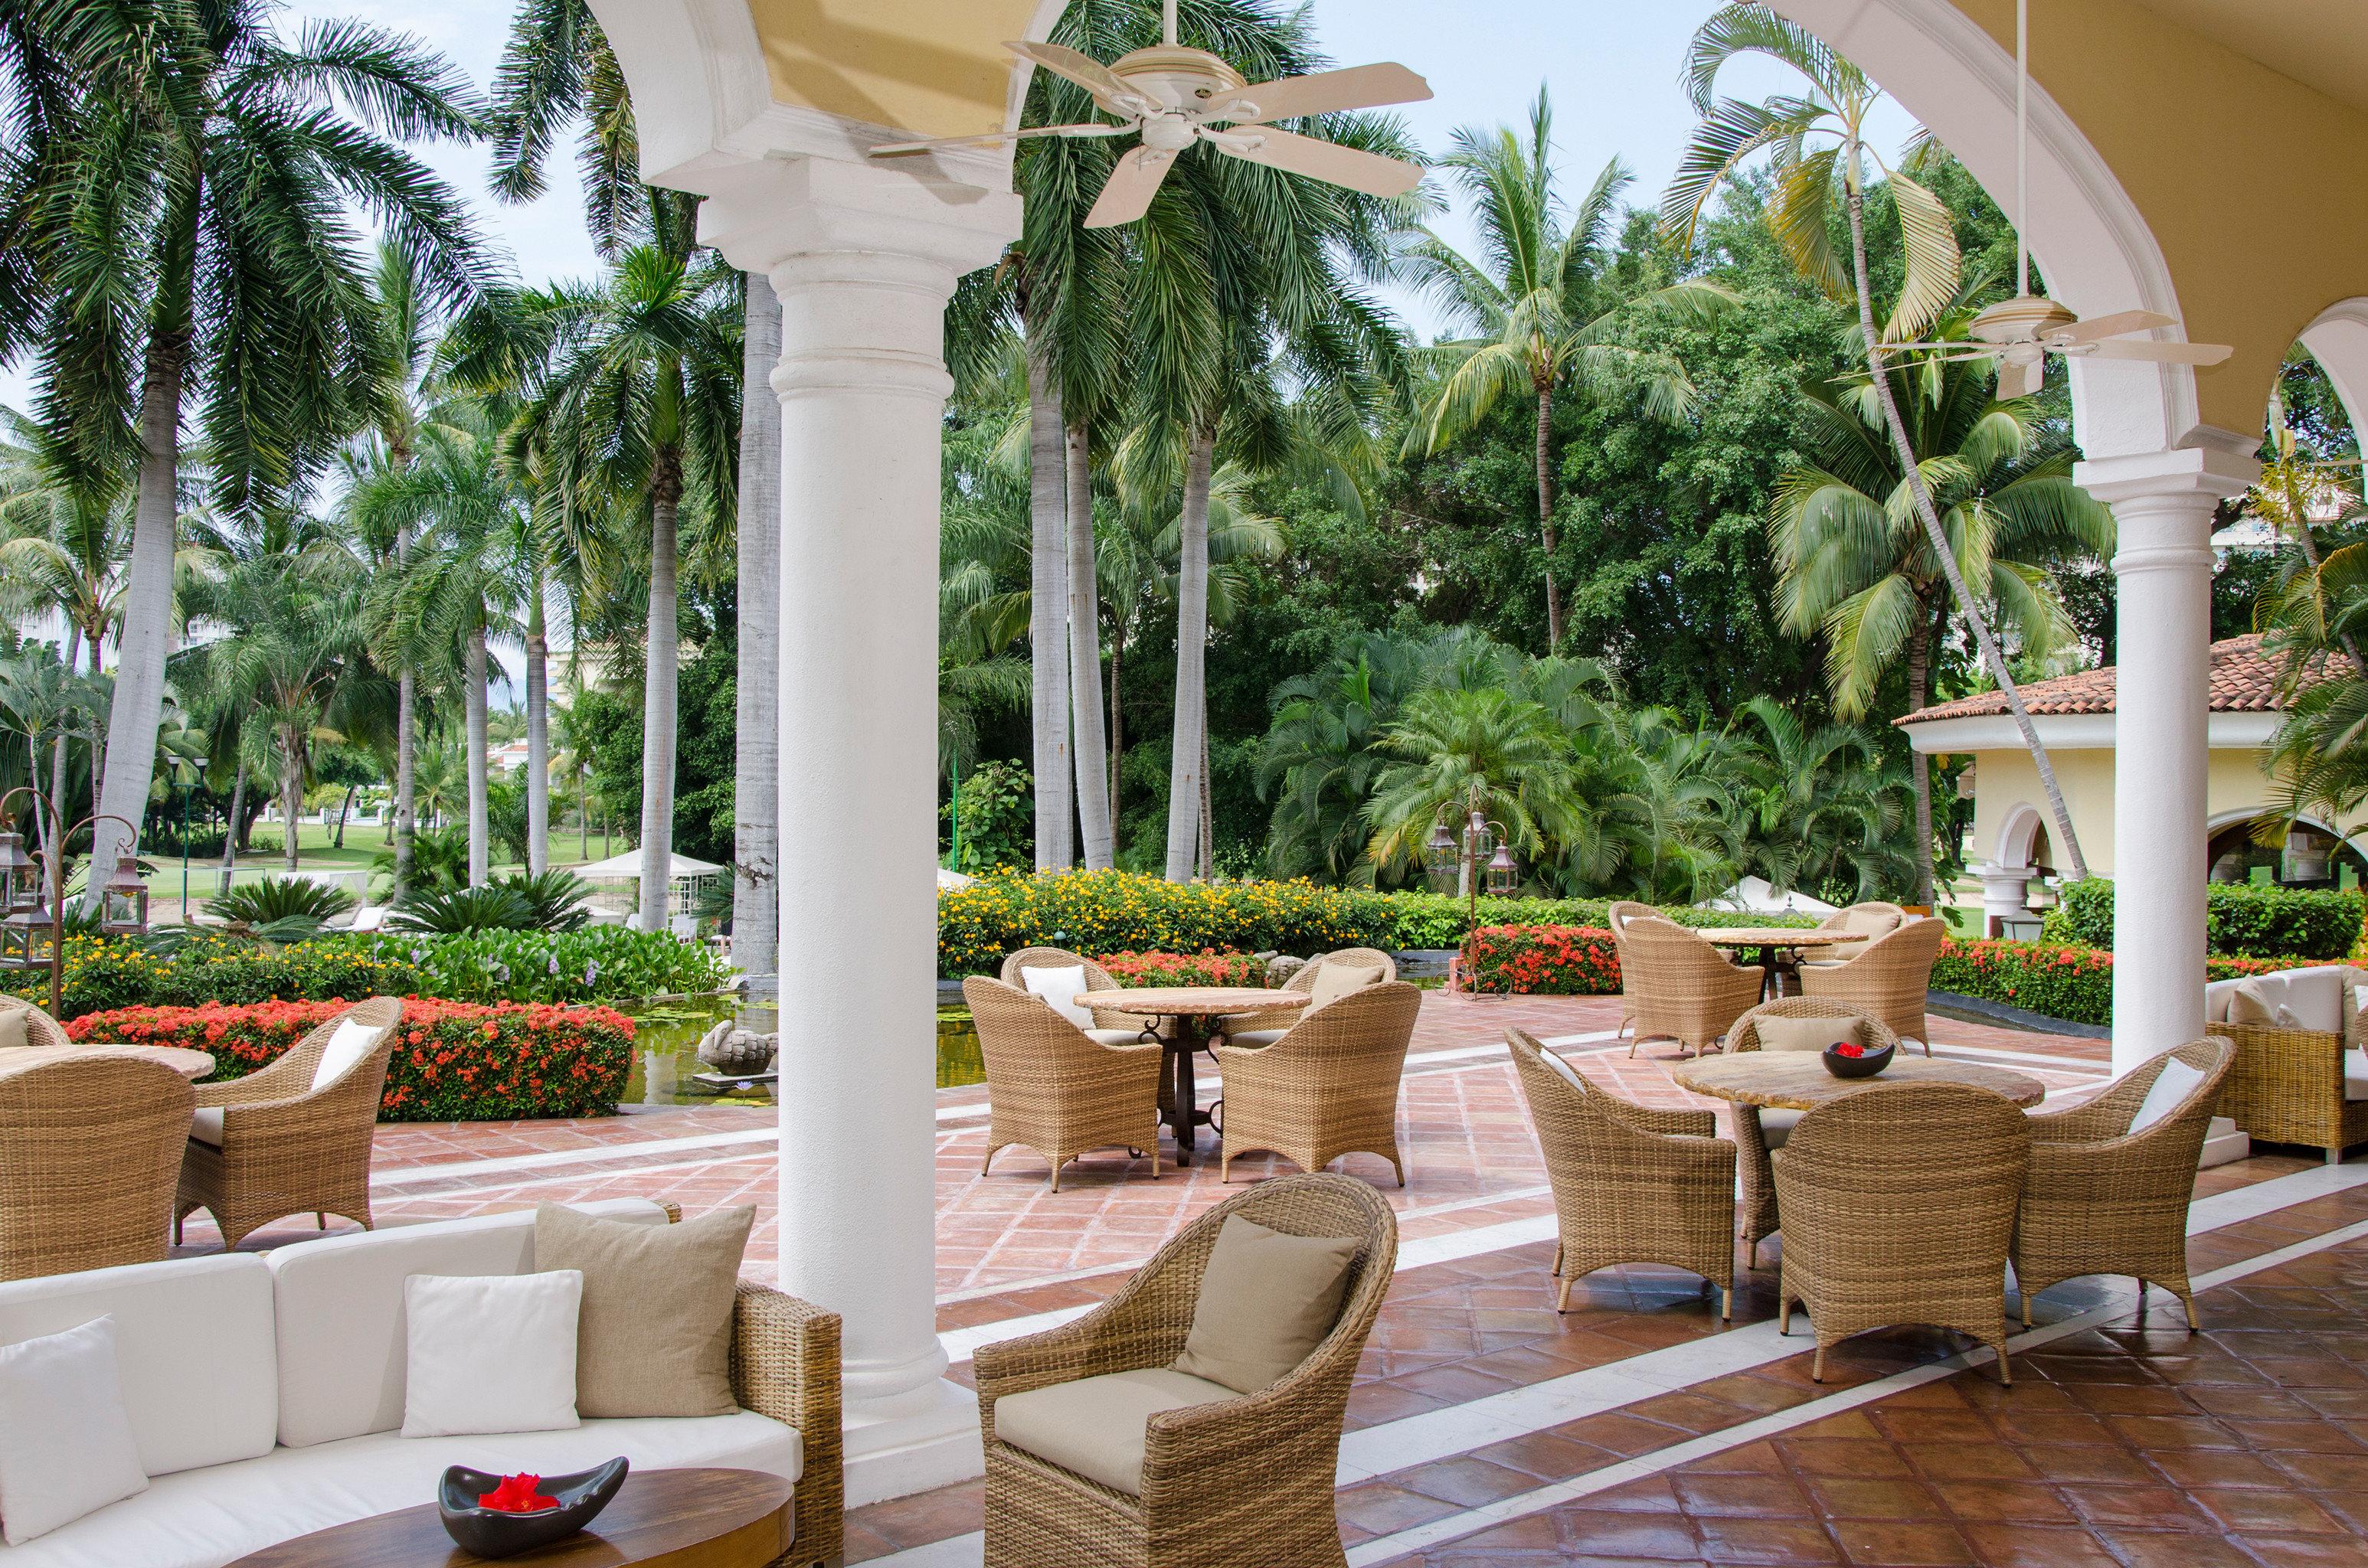 Elegant Hip Lounge Luxury Modern Tropical tree property Resort Courtyard arecales home backyard Villa outdoor structure Garden yard hacienda condominium restaurant